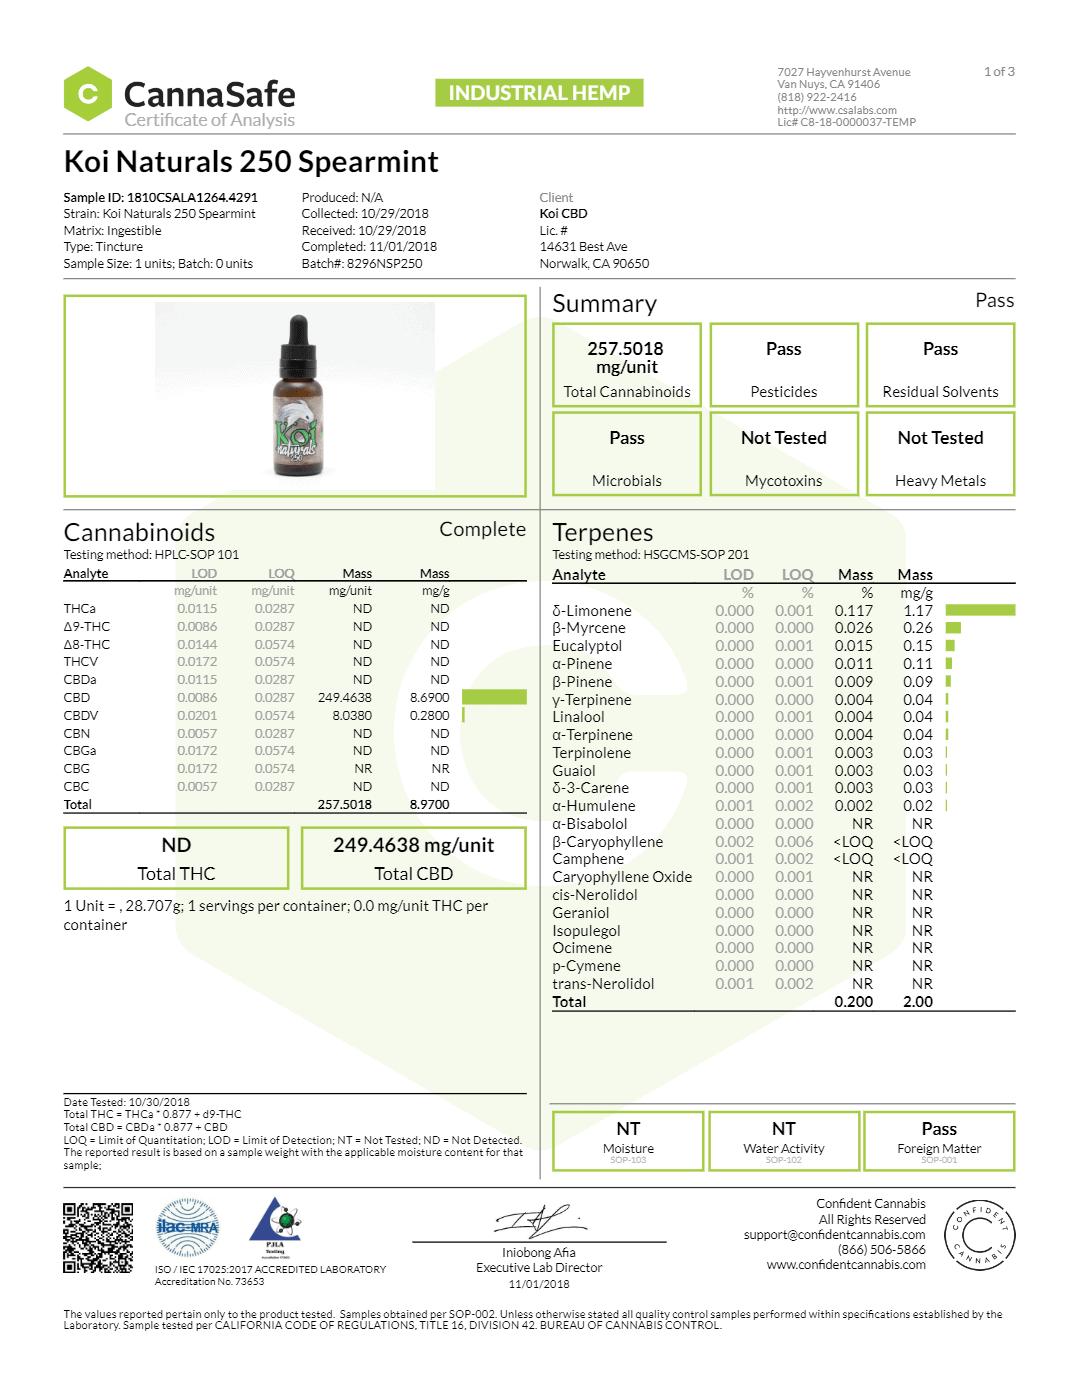 KOi CBD guarantee